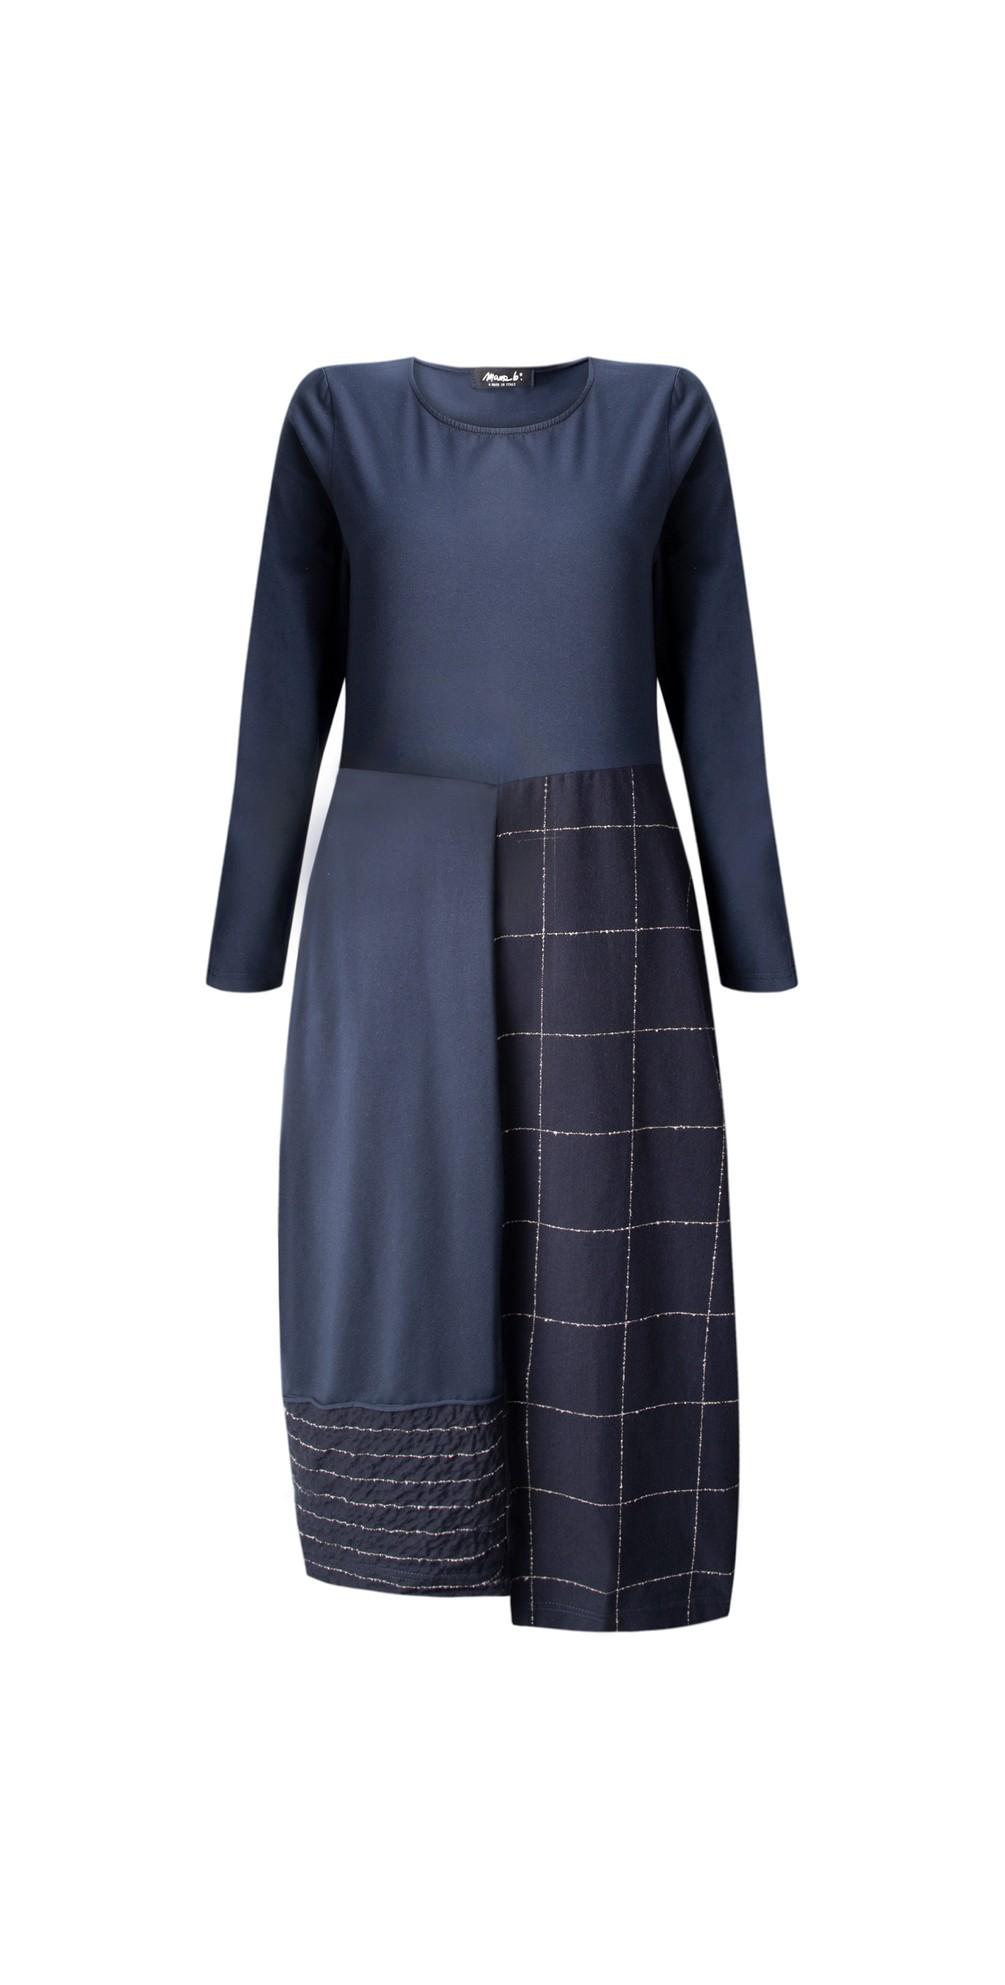 Panna Q Qsant Cotton Check Dress main image